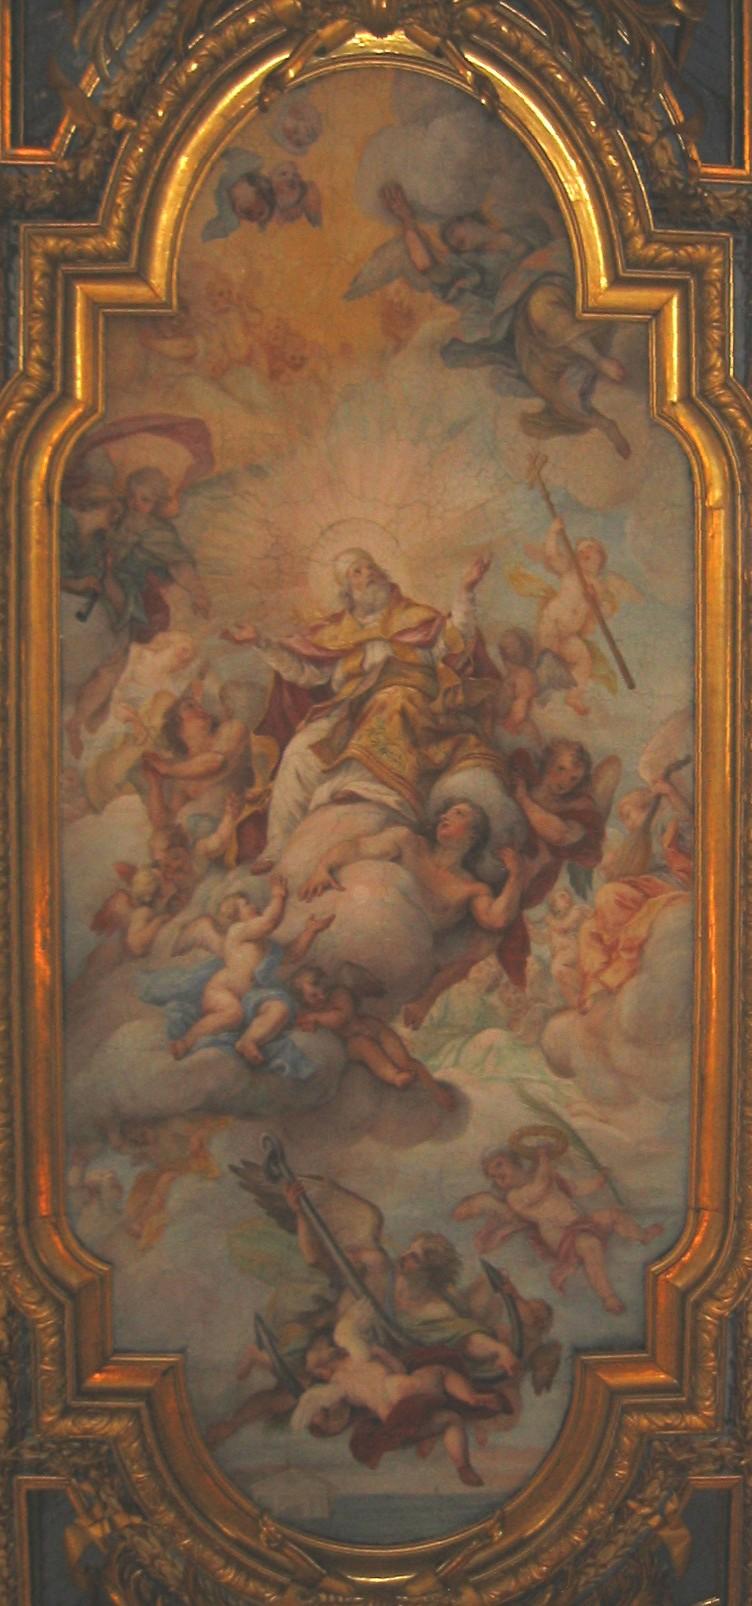 Heiliger Clemens